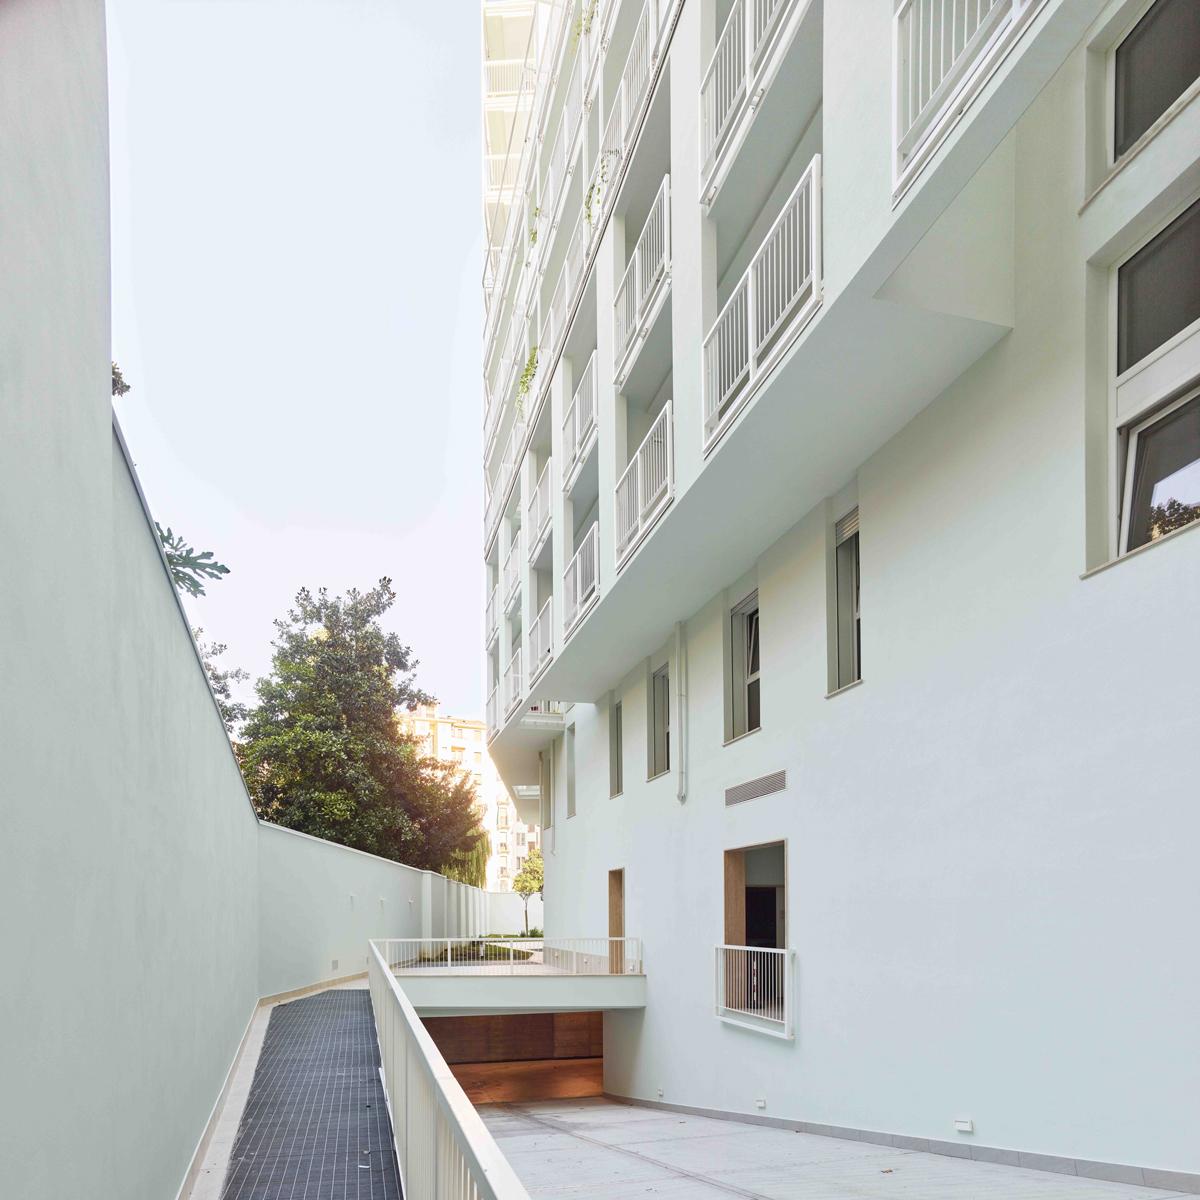 Degli-Esposti-Architetti-Milan-Casa-Selene-05